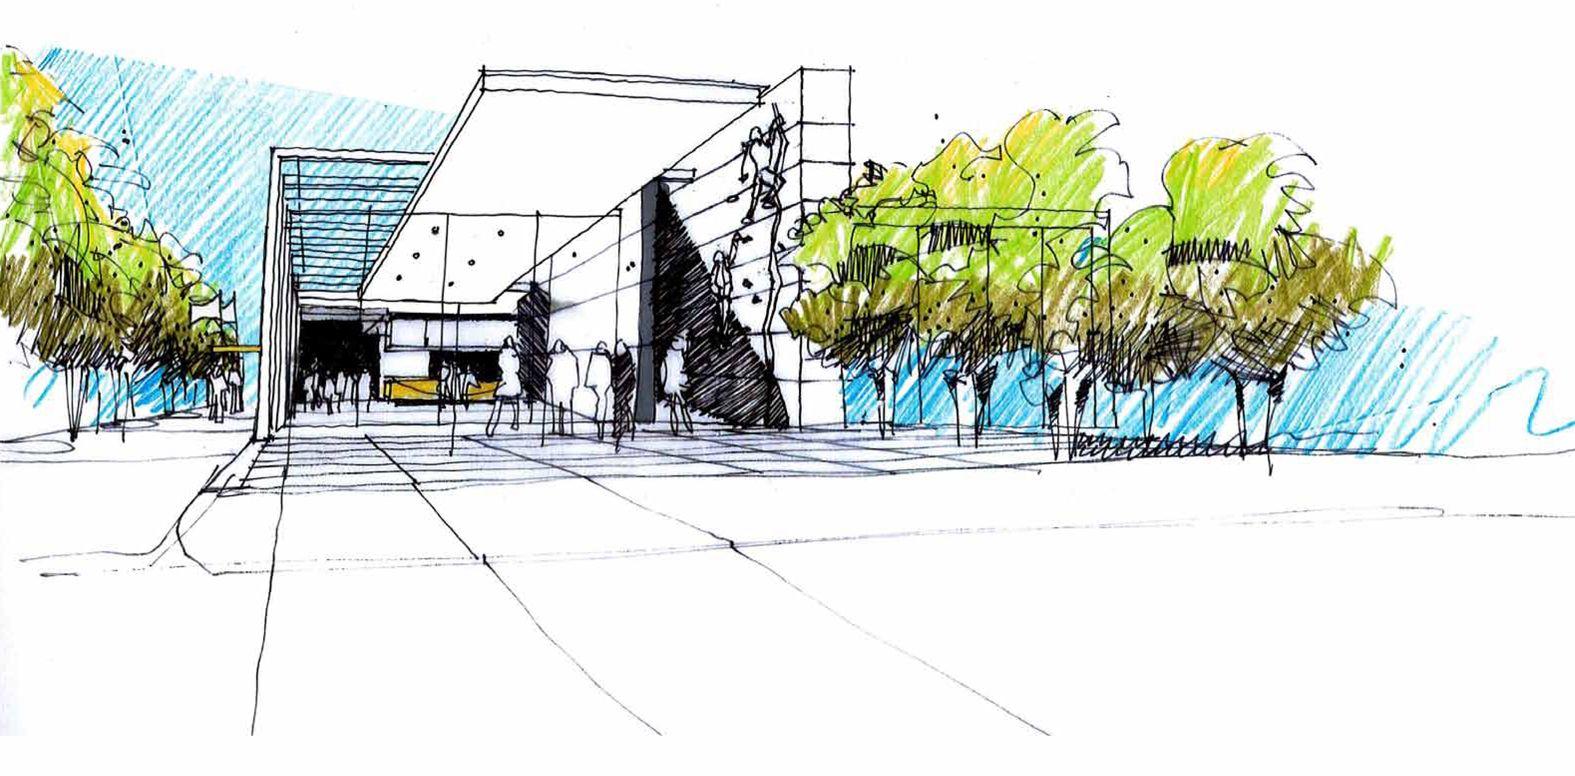 Urban design concepts sketches the for Urban design concepts architecture